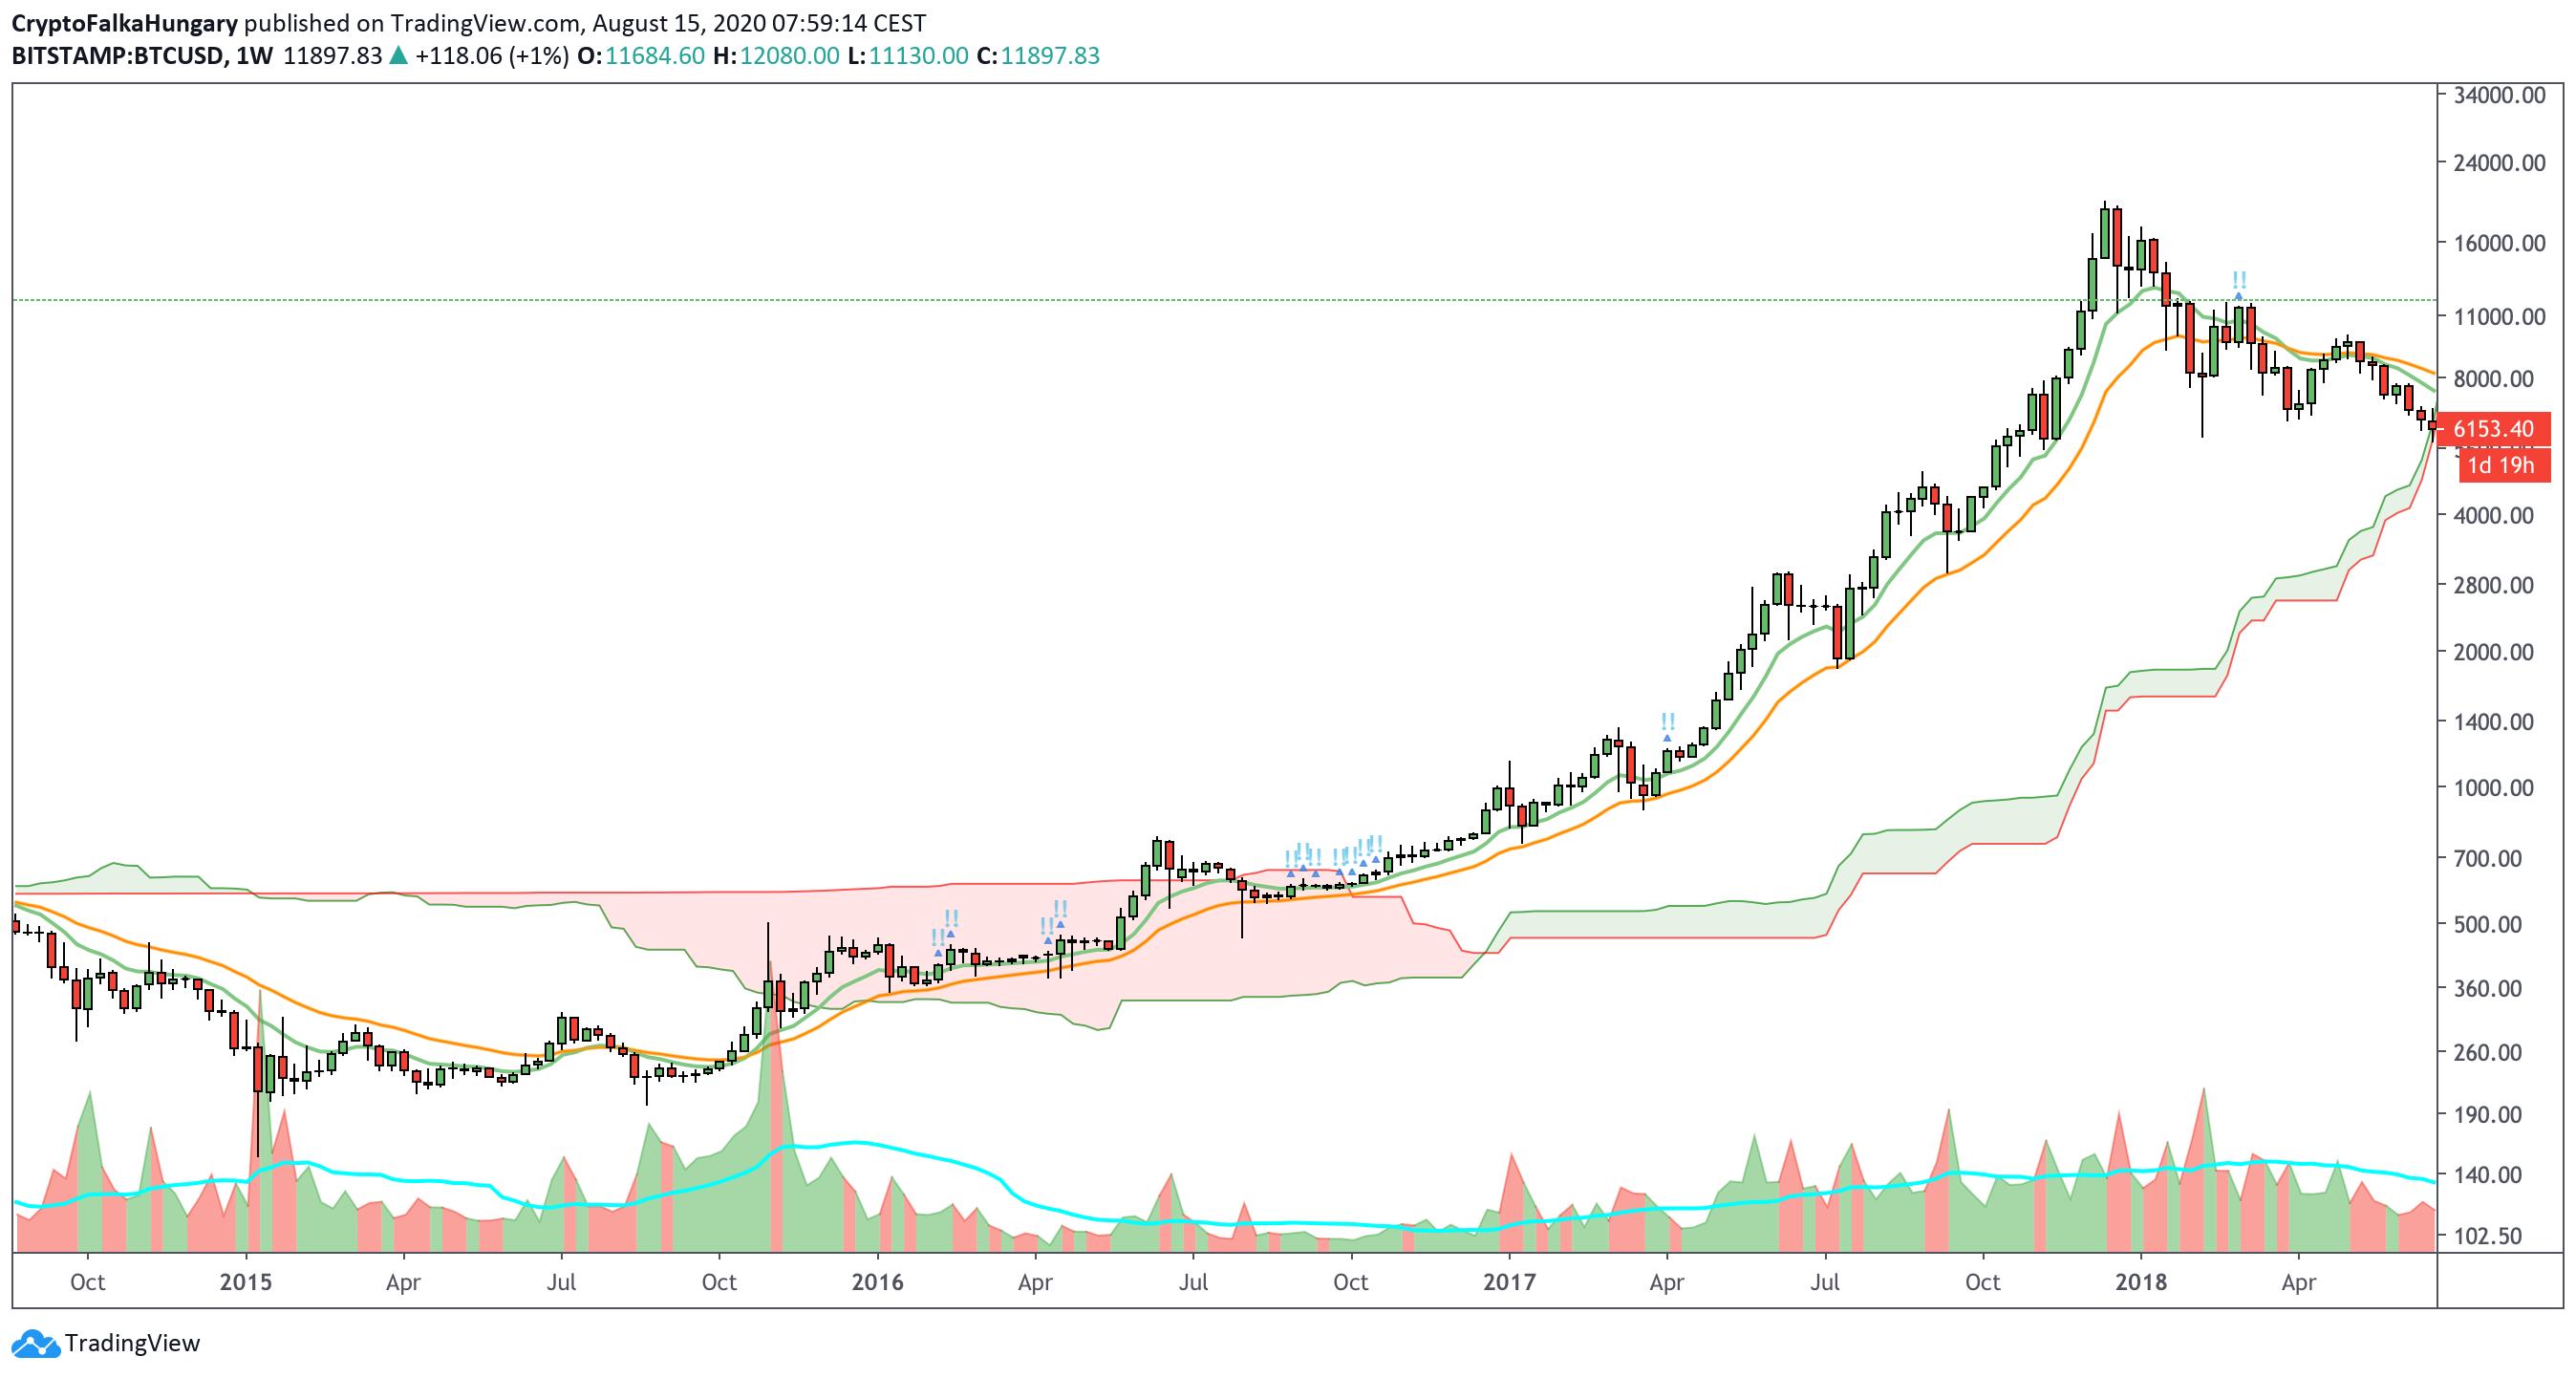 Bitcoin bika piac I Cryptofalka